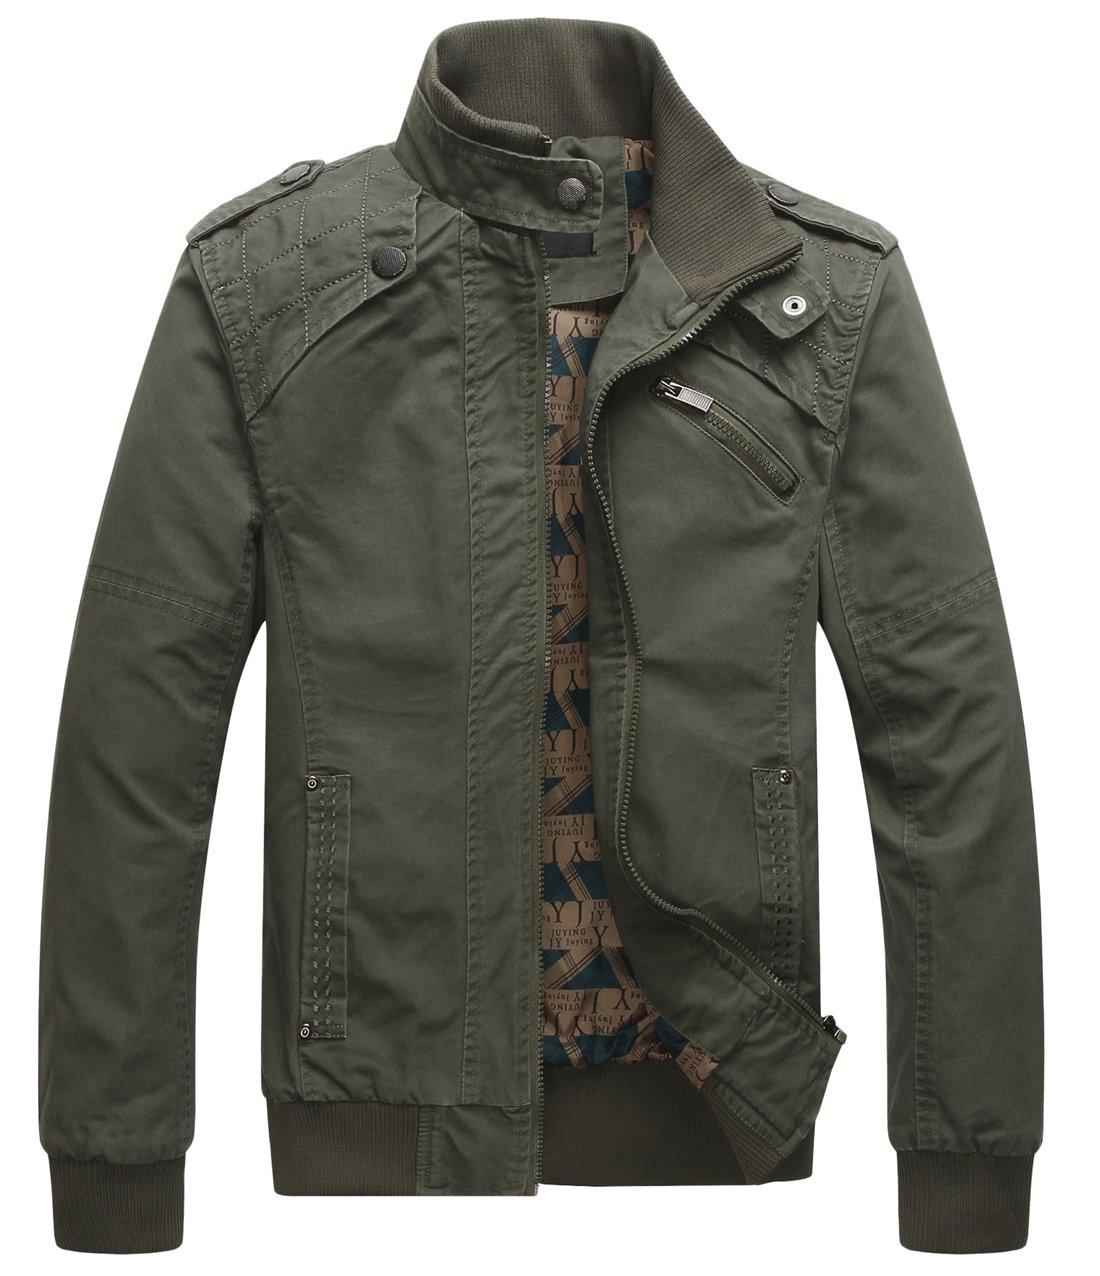 chouyatou Men's Casual Long Sleeve Full Zip Jacket with Shoulder Straps (Medium, Army Green) by chouyatou